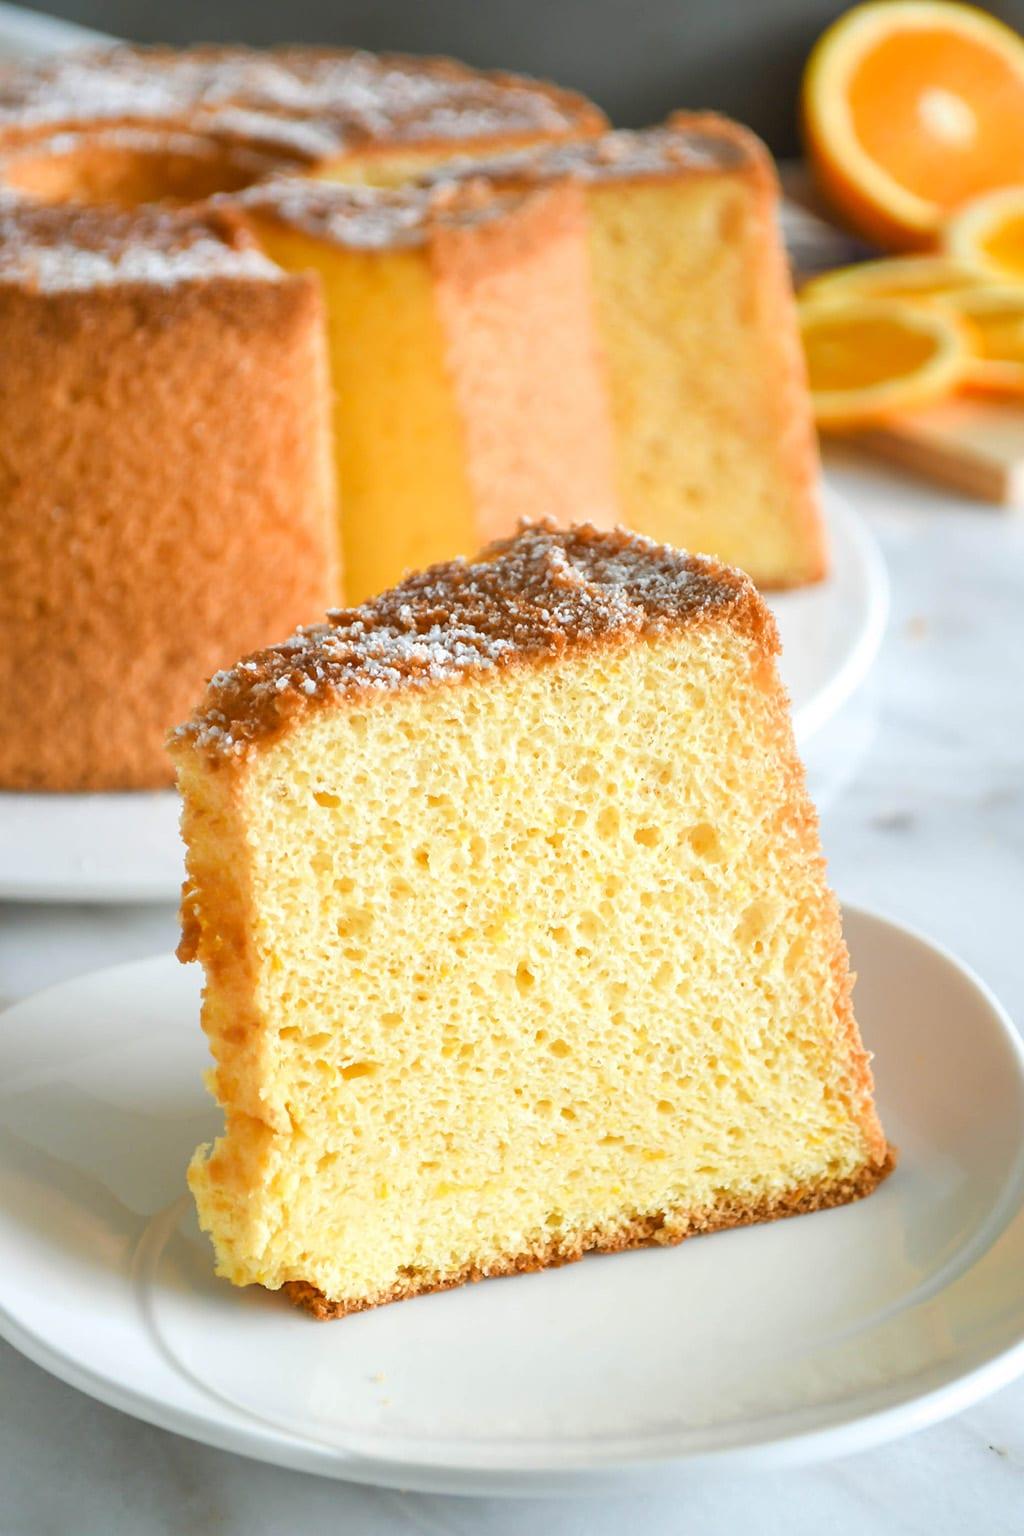 Orange chiffon cake slice, on a serving plate